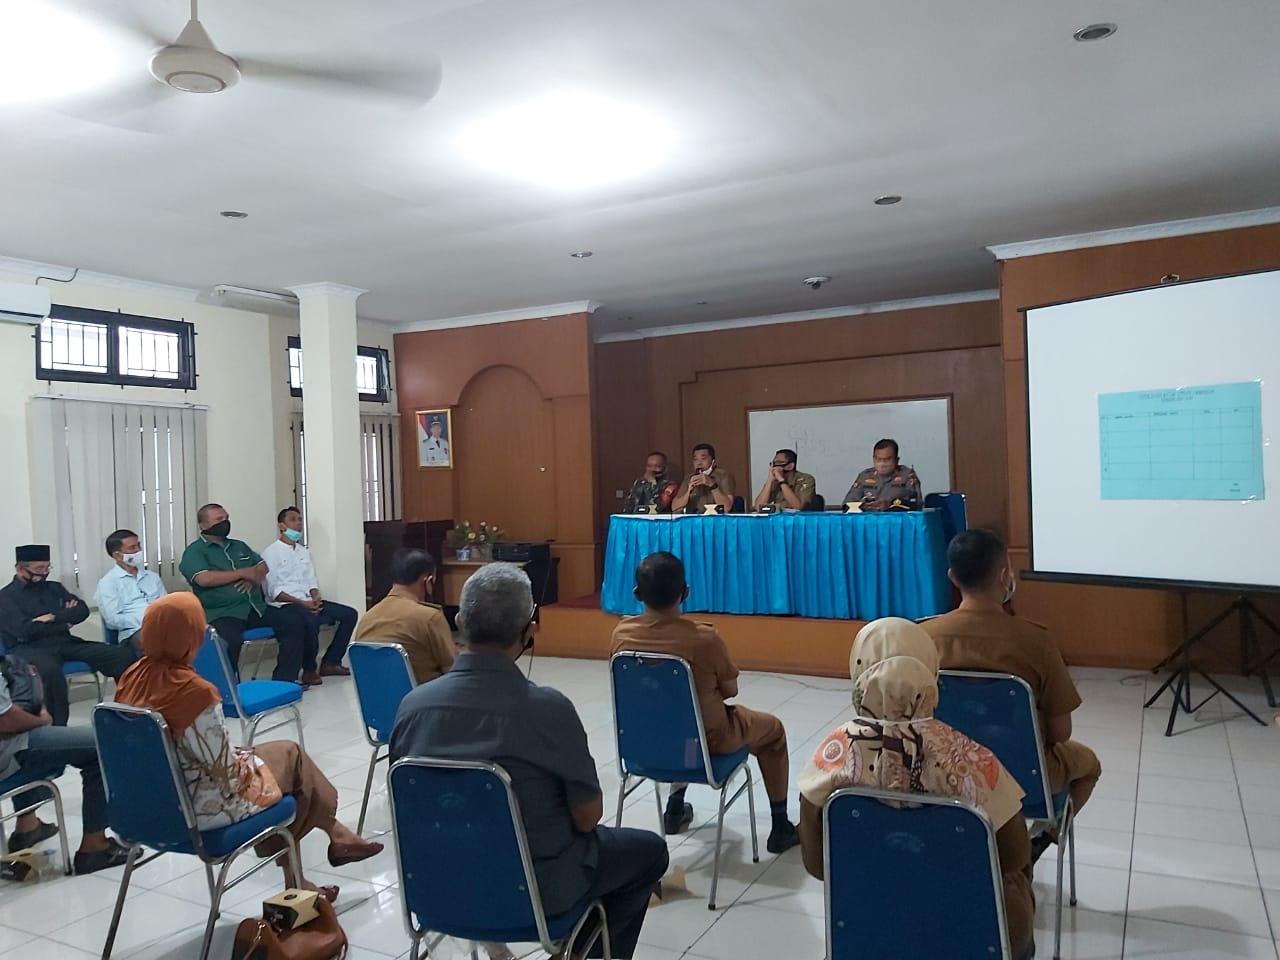 Image : Camat Harapkan Ketua LPM Lima Puluh Bersinergi dengan Pemerintah